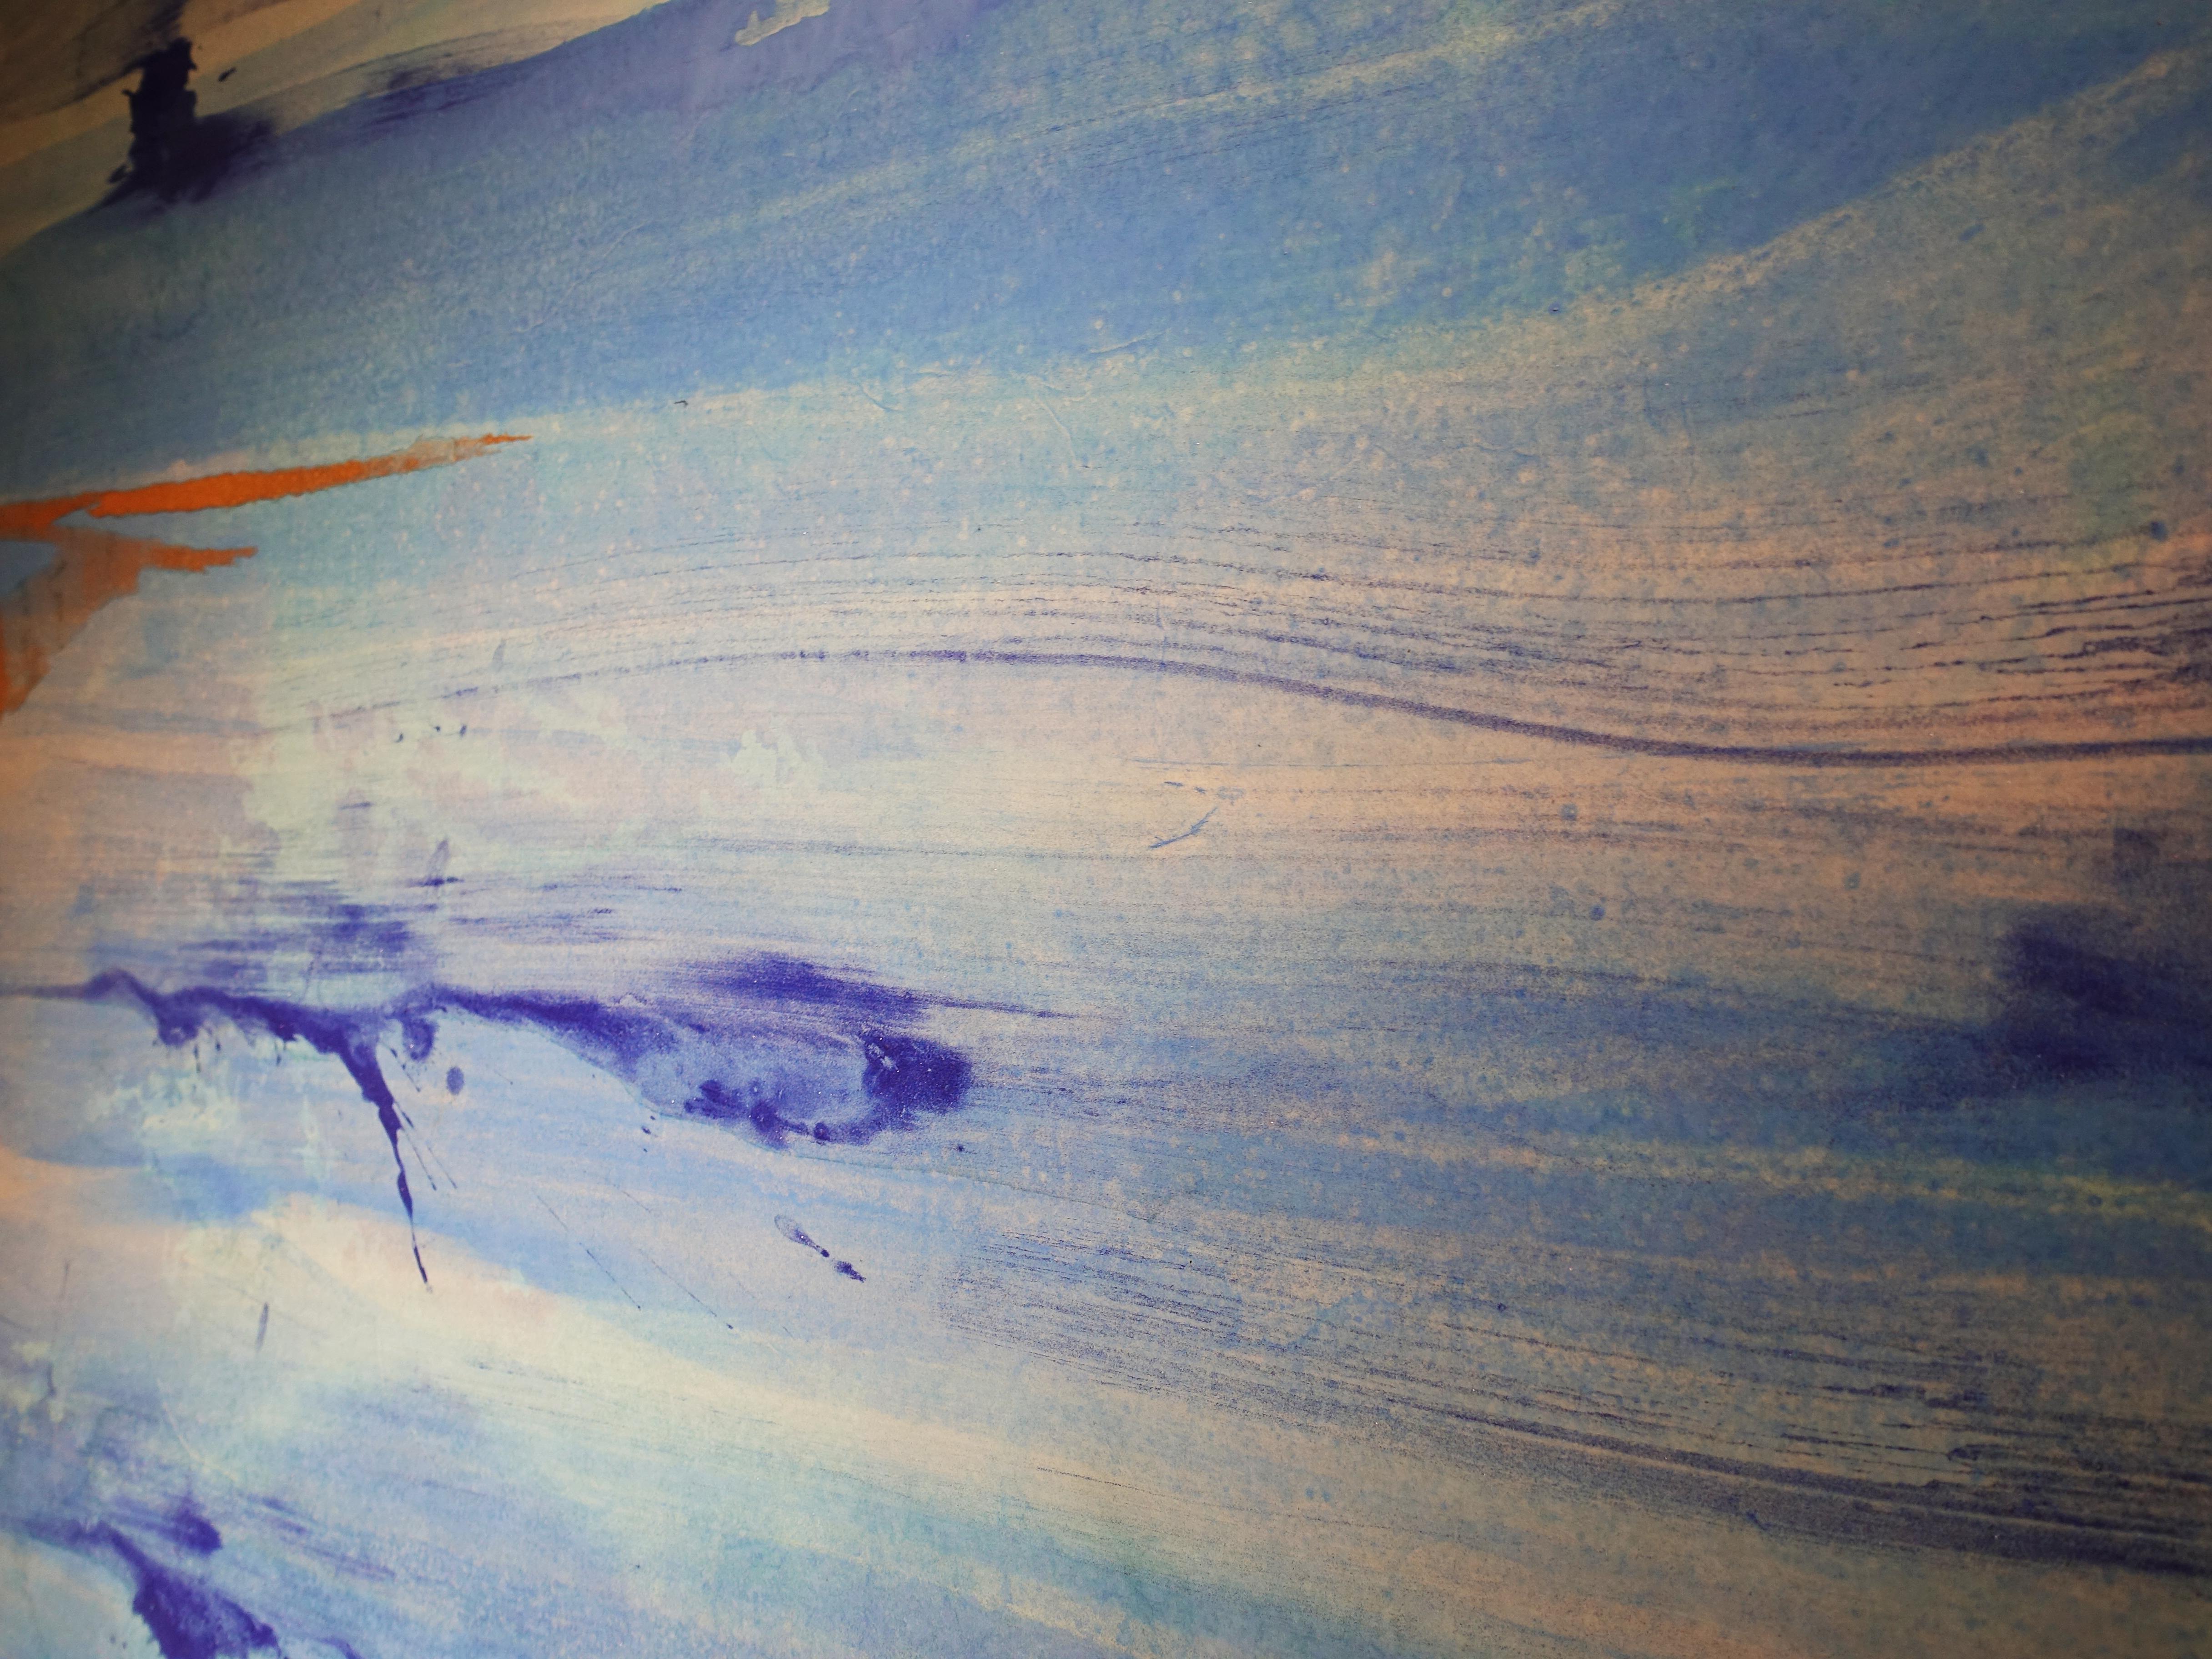 Makoto Fujimura,《January Hour-Nard》細節,137.2 x 94 cm,天然礦物顏料、牡蠣殼、金、雲肌紙,2018。